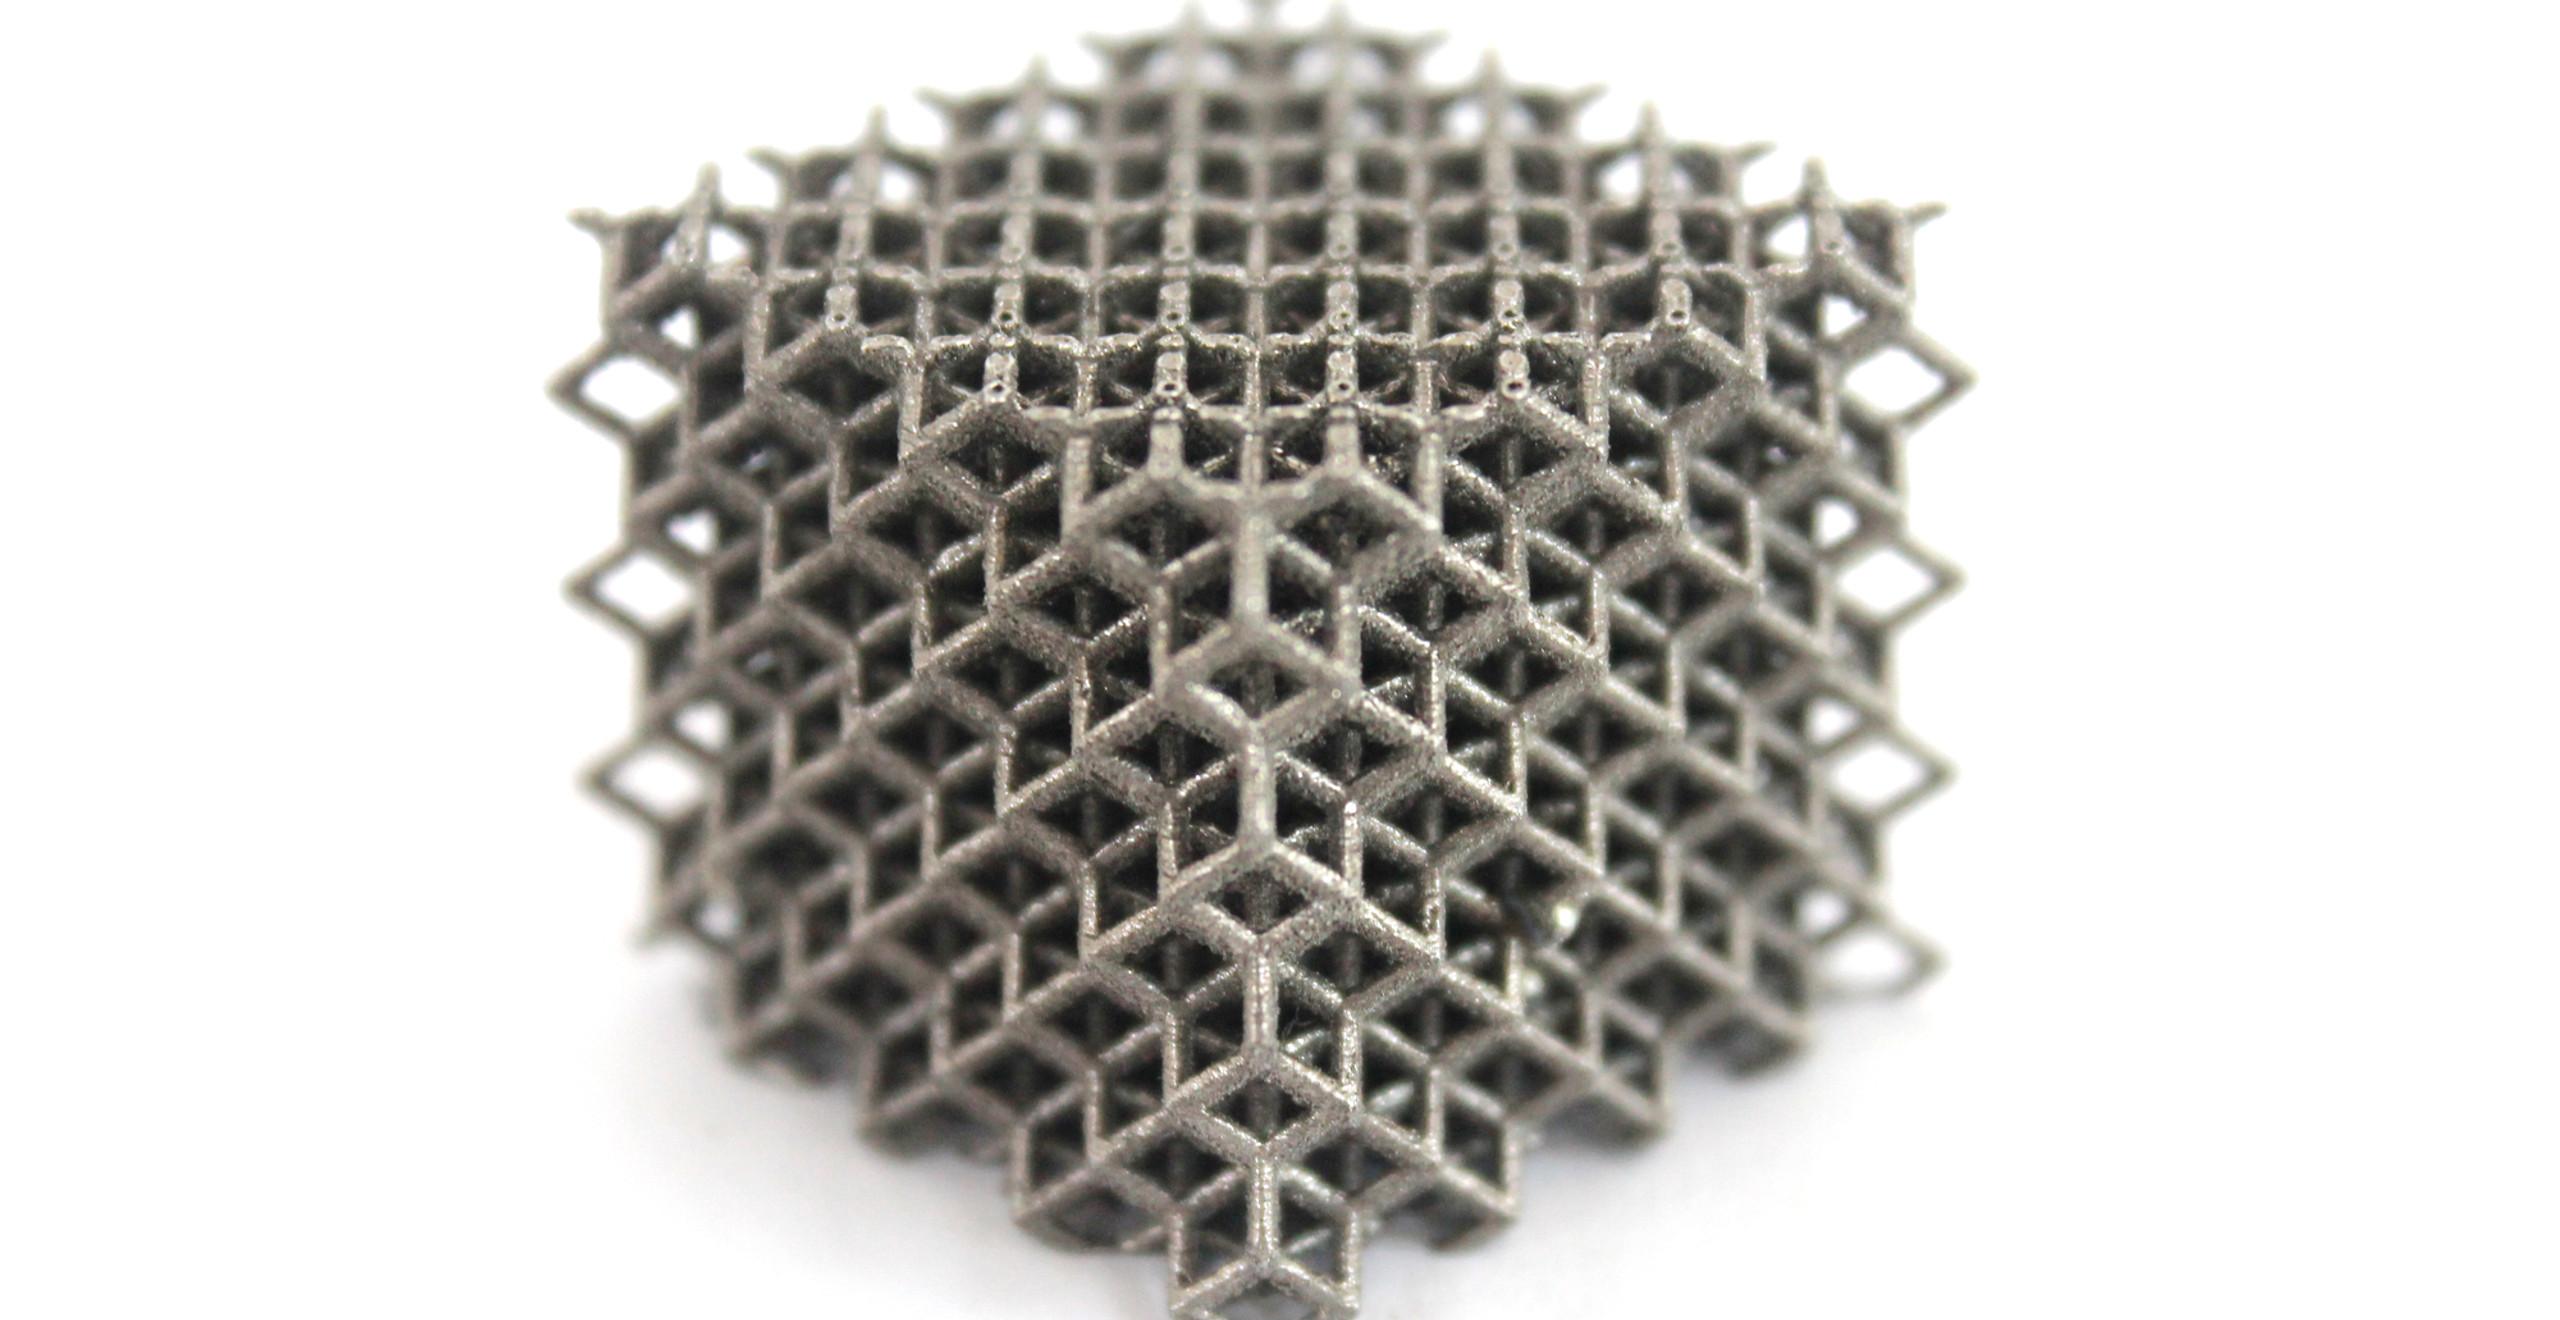 lattice inox fusão seletiva a laser slm alkimat brasil treliçada